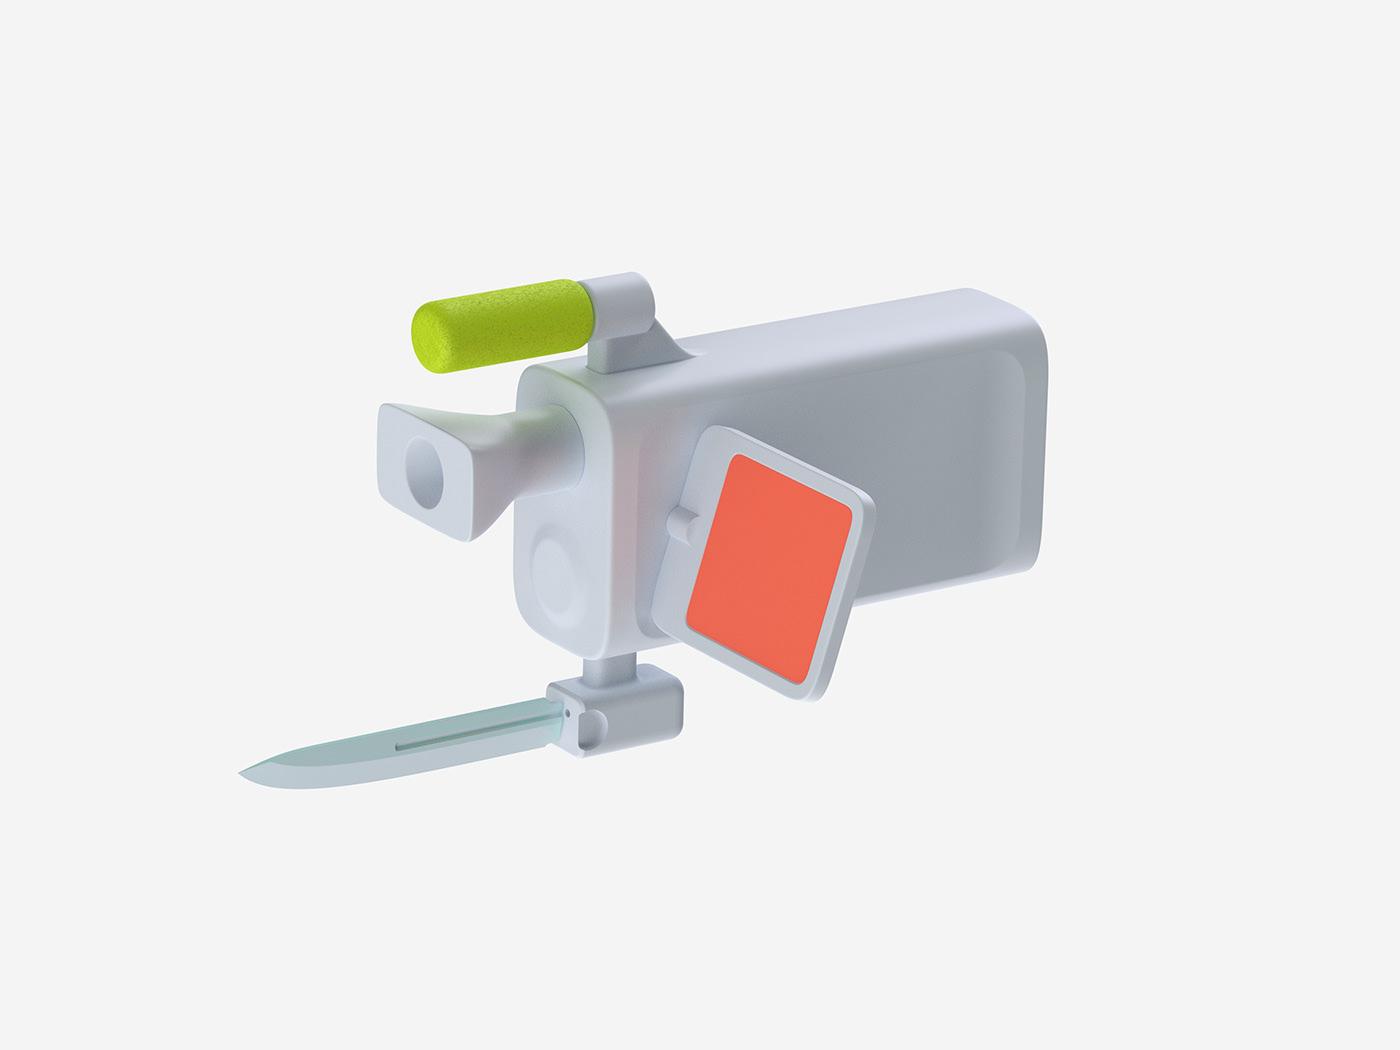 design minimal color apple industrial speculative art critical sculpture keyshot